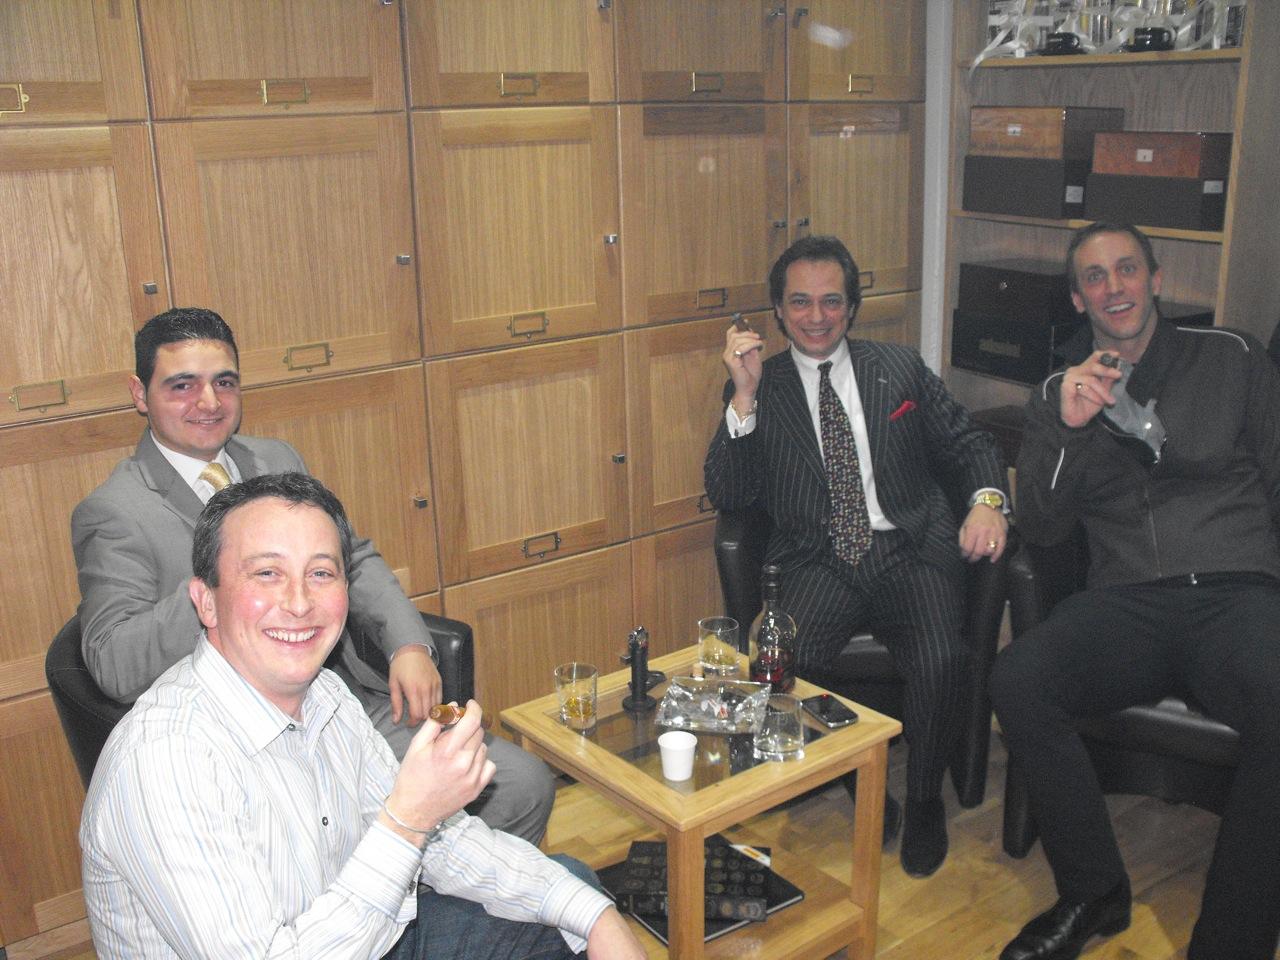 Alfie Turmeaus Mayfair Cigar Shop Indoor Sampling Lounge